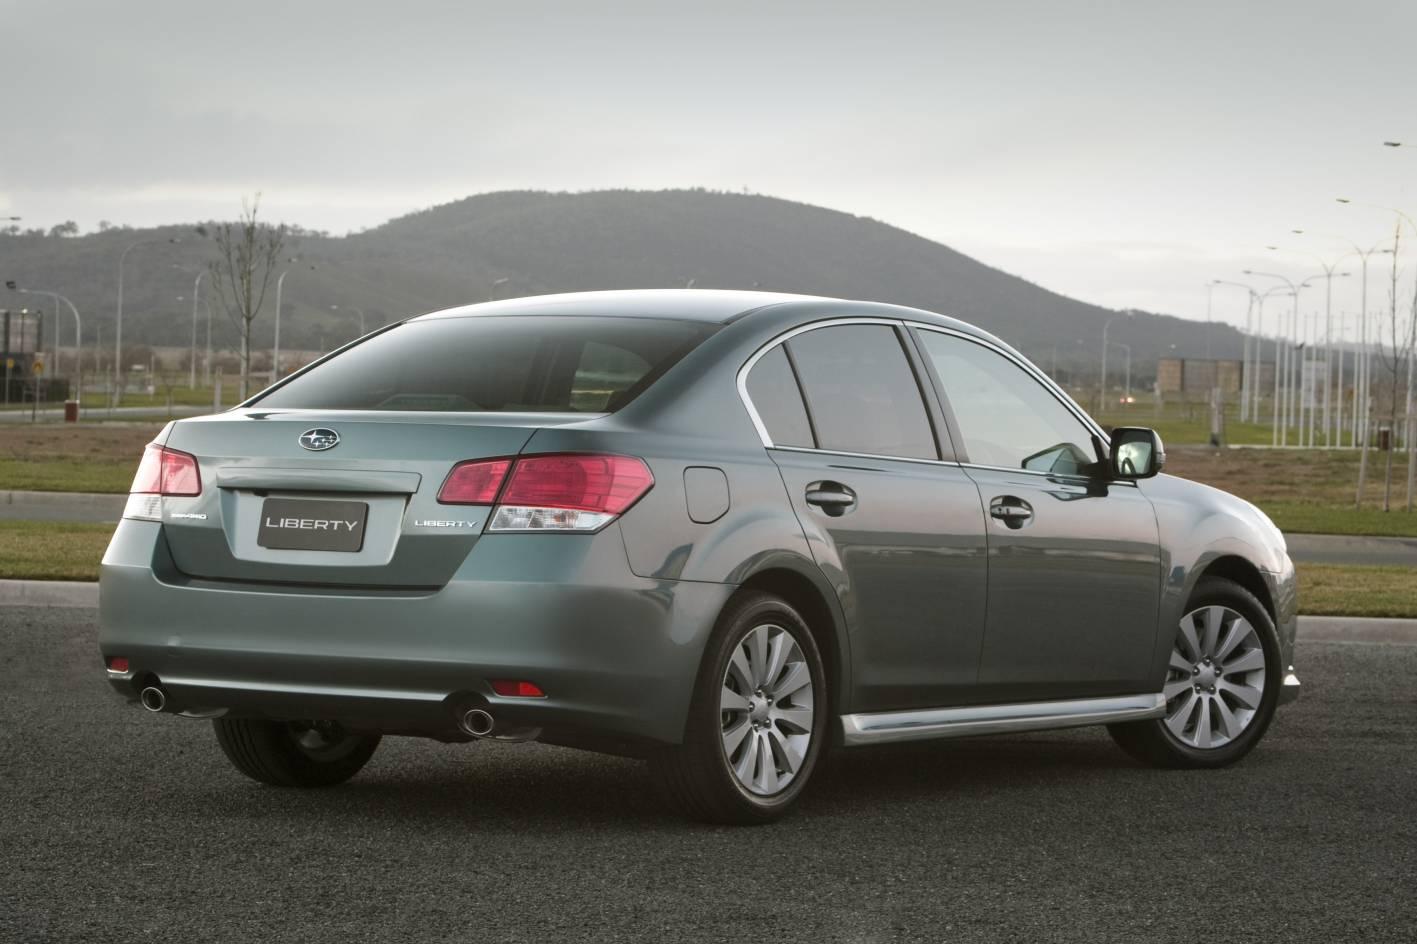 2018 Toyota Supra >> 2012 Subaru Liberty gets standard reversing camera, full-size alloy spare - photos   CarAdvice